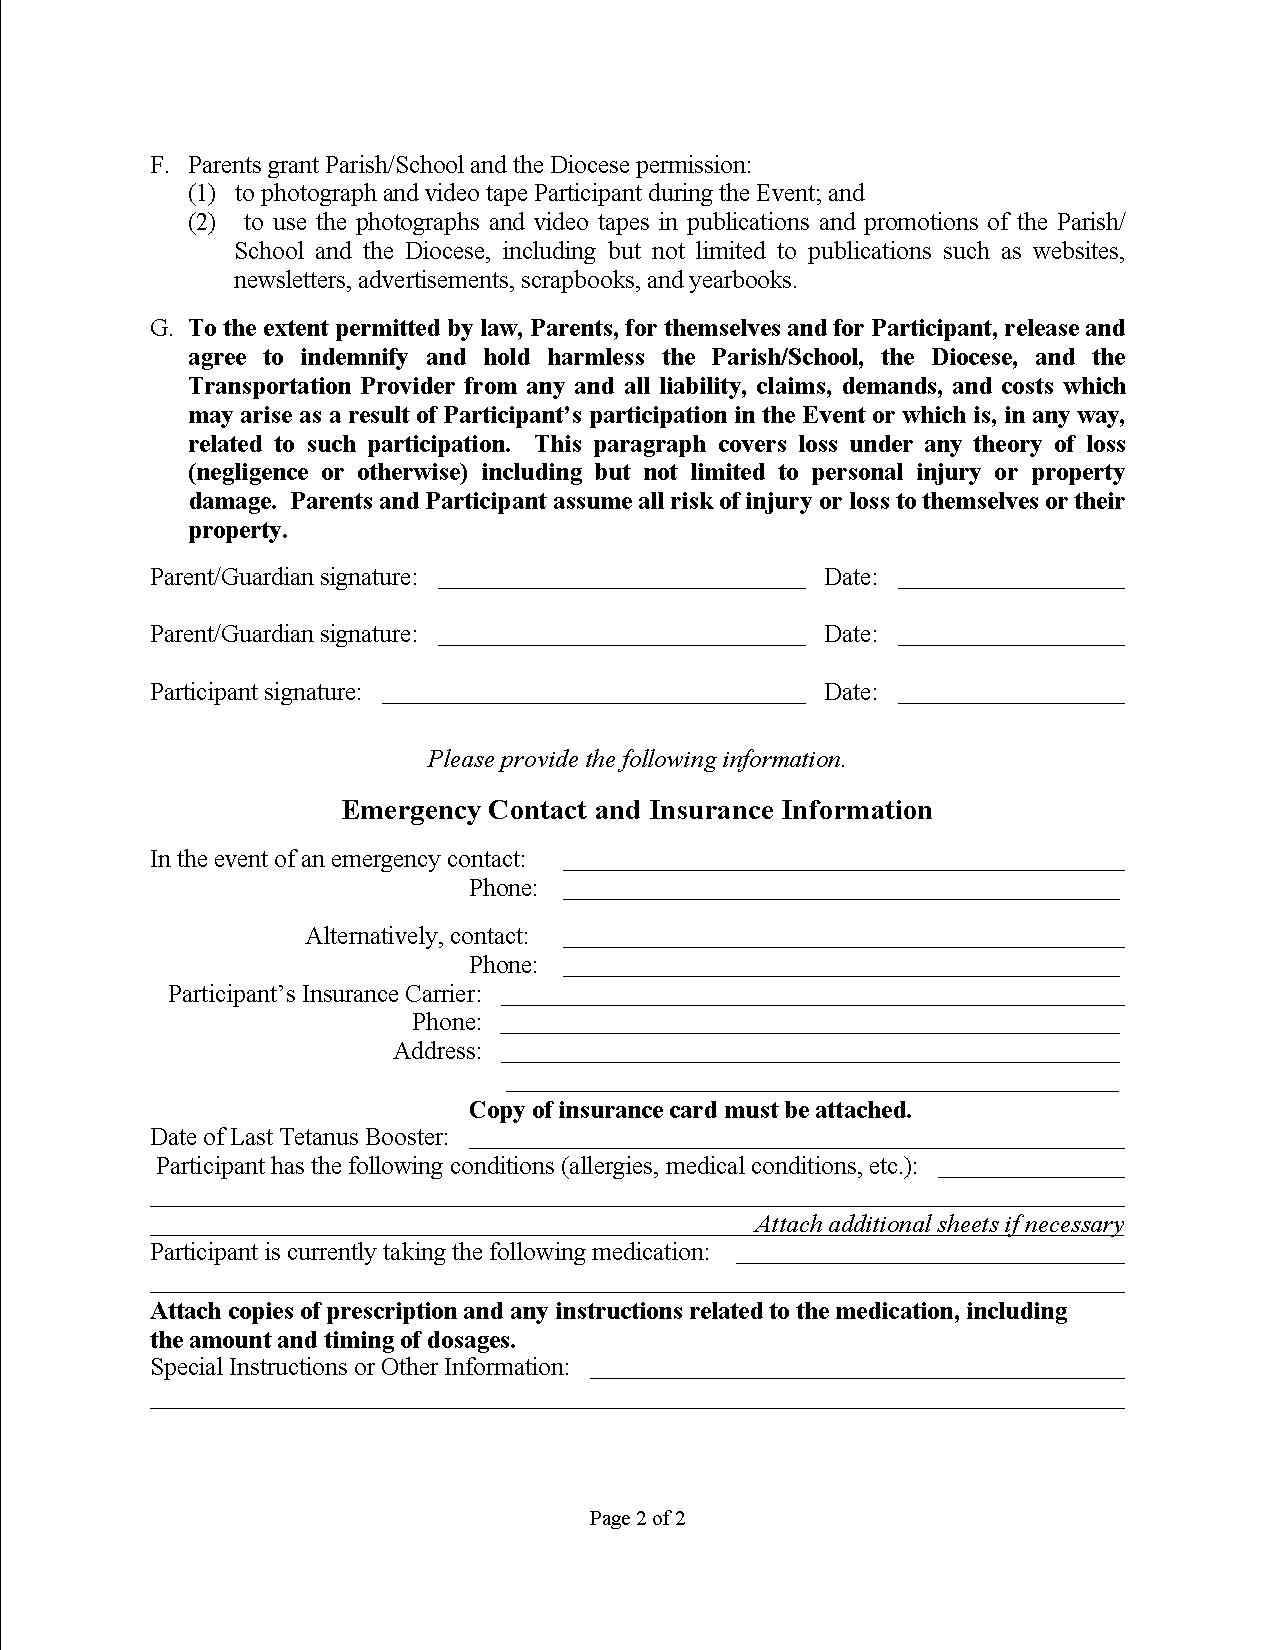 Prazosin Medication Consent Form